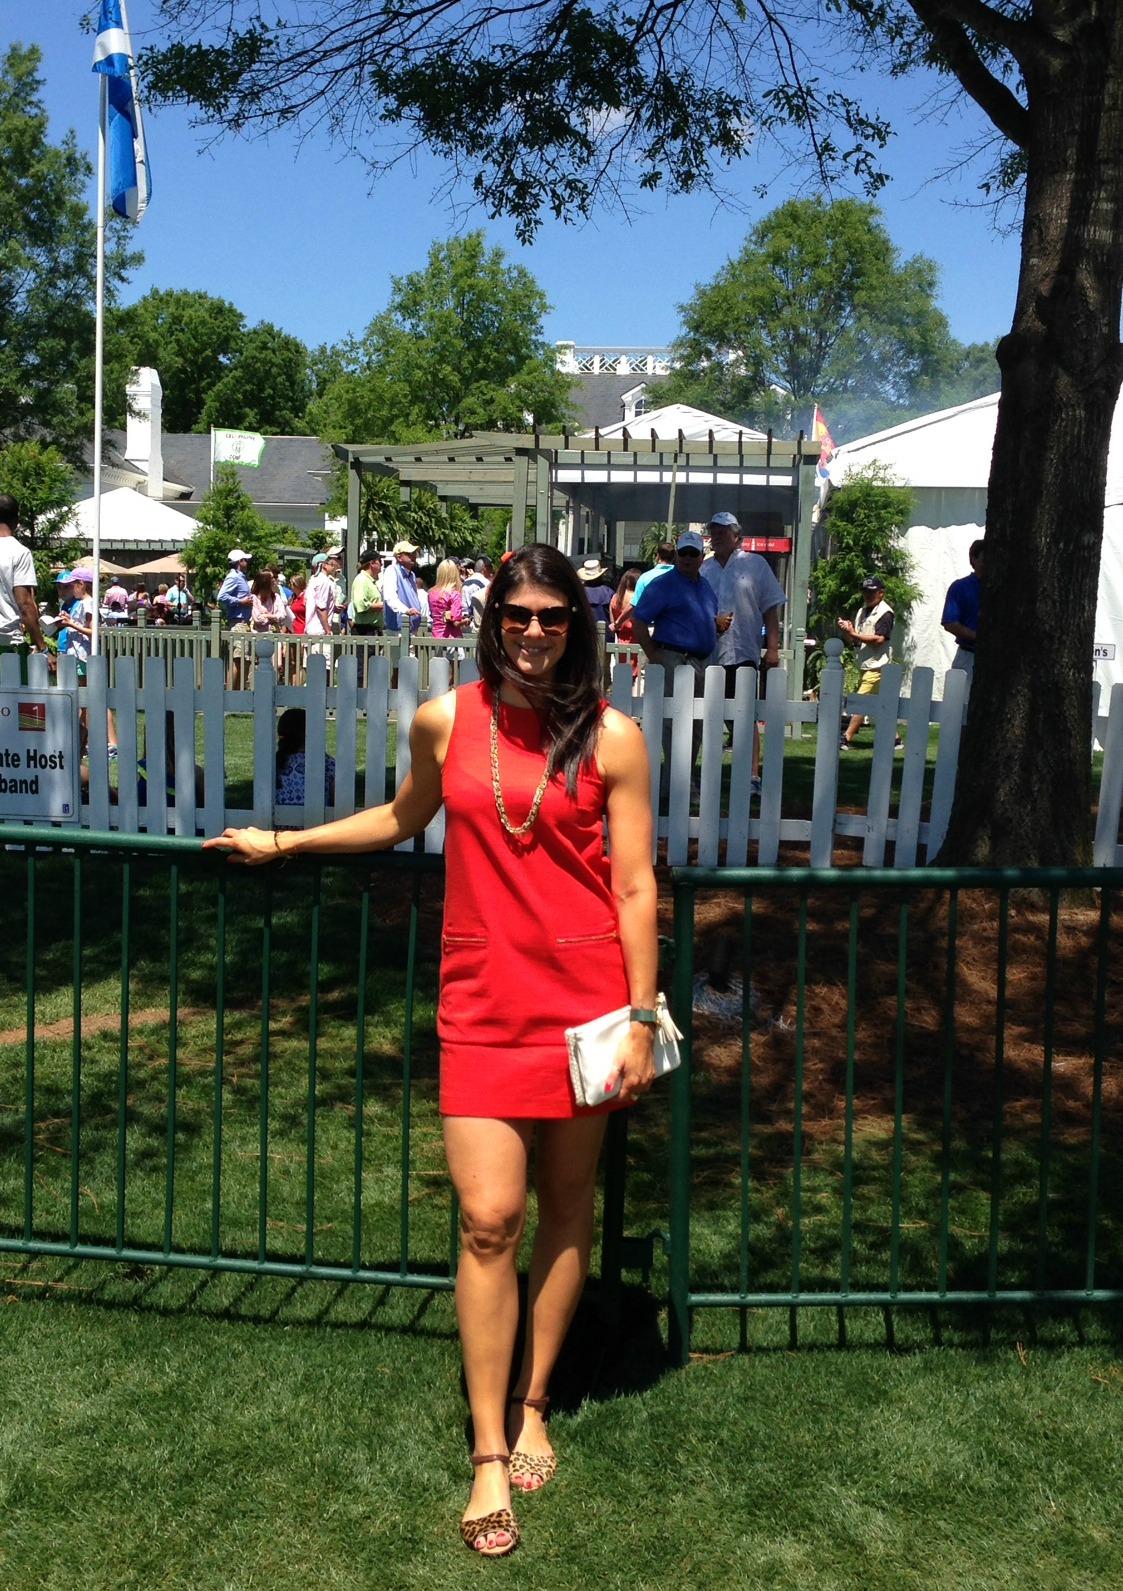 LS - Wells Fargo Golf Tourney 2014